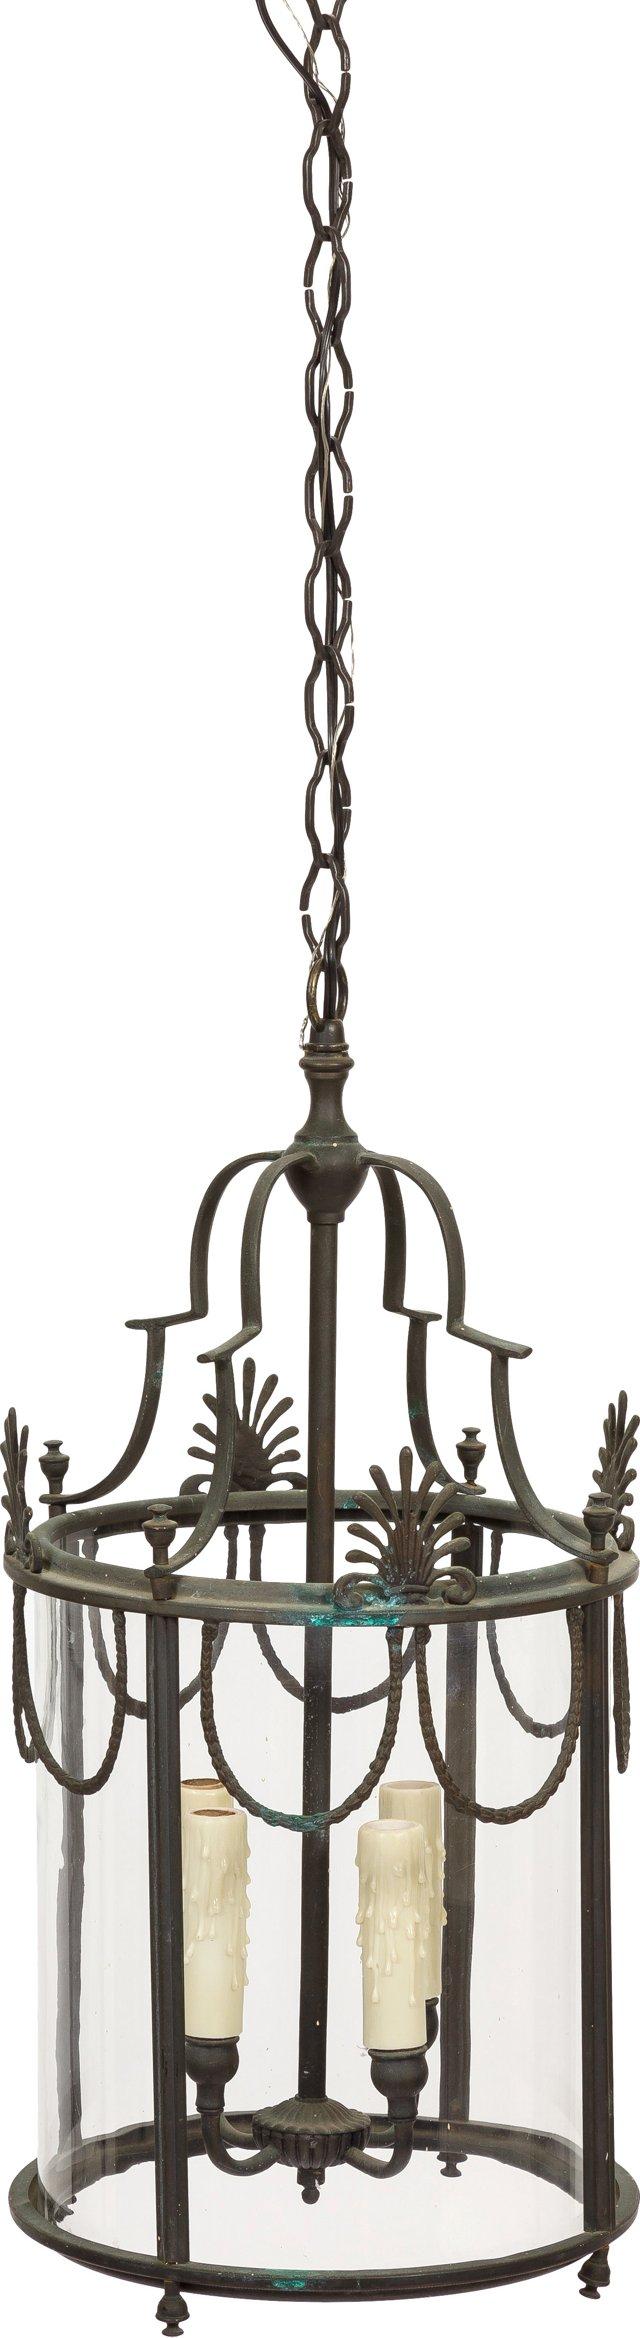 French Steel & Glass Lantern